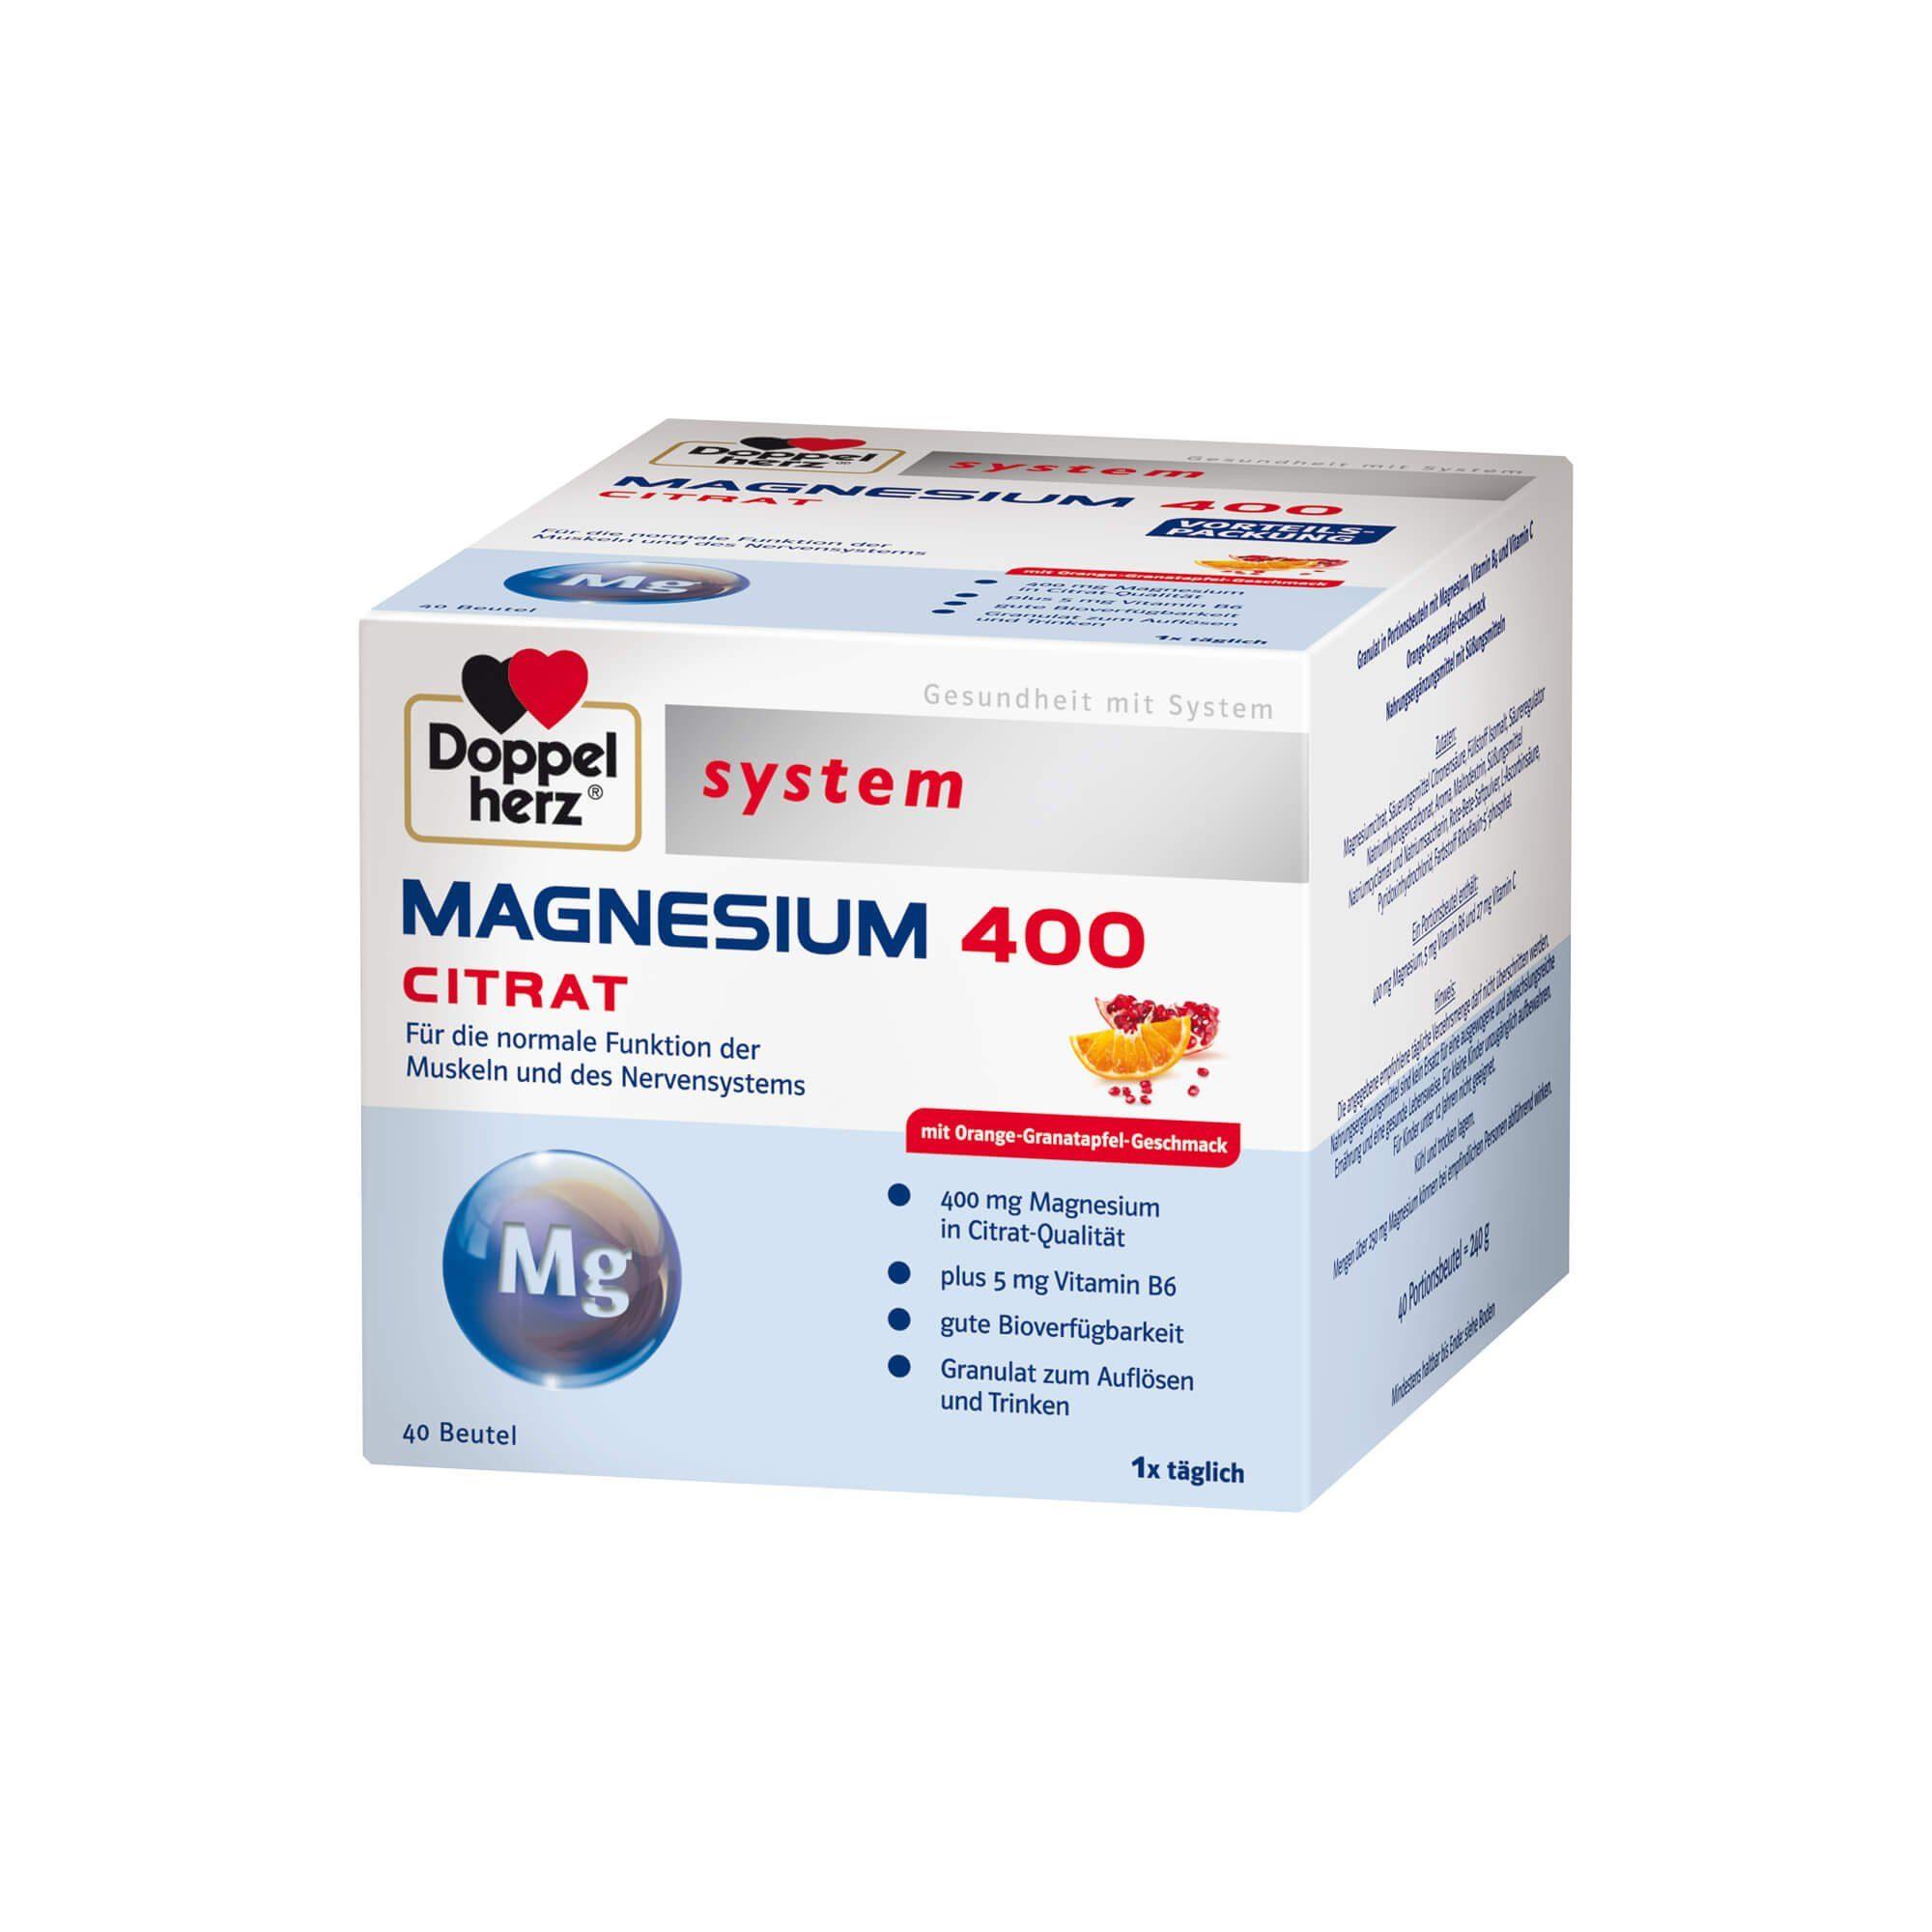 Doppelherz Magnesium 400 Citrat system , 40 St